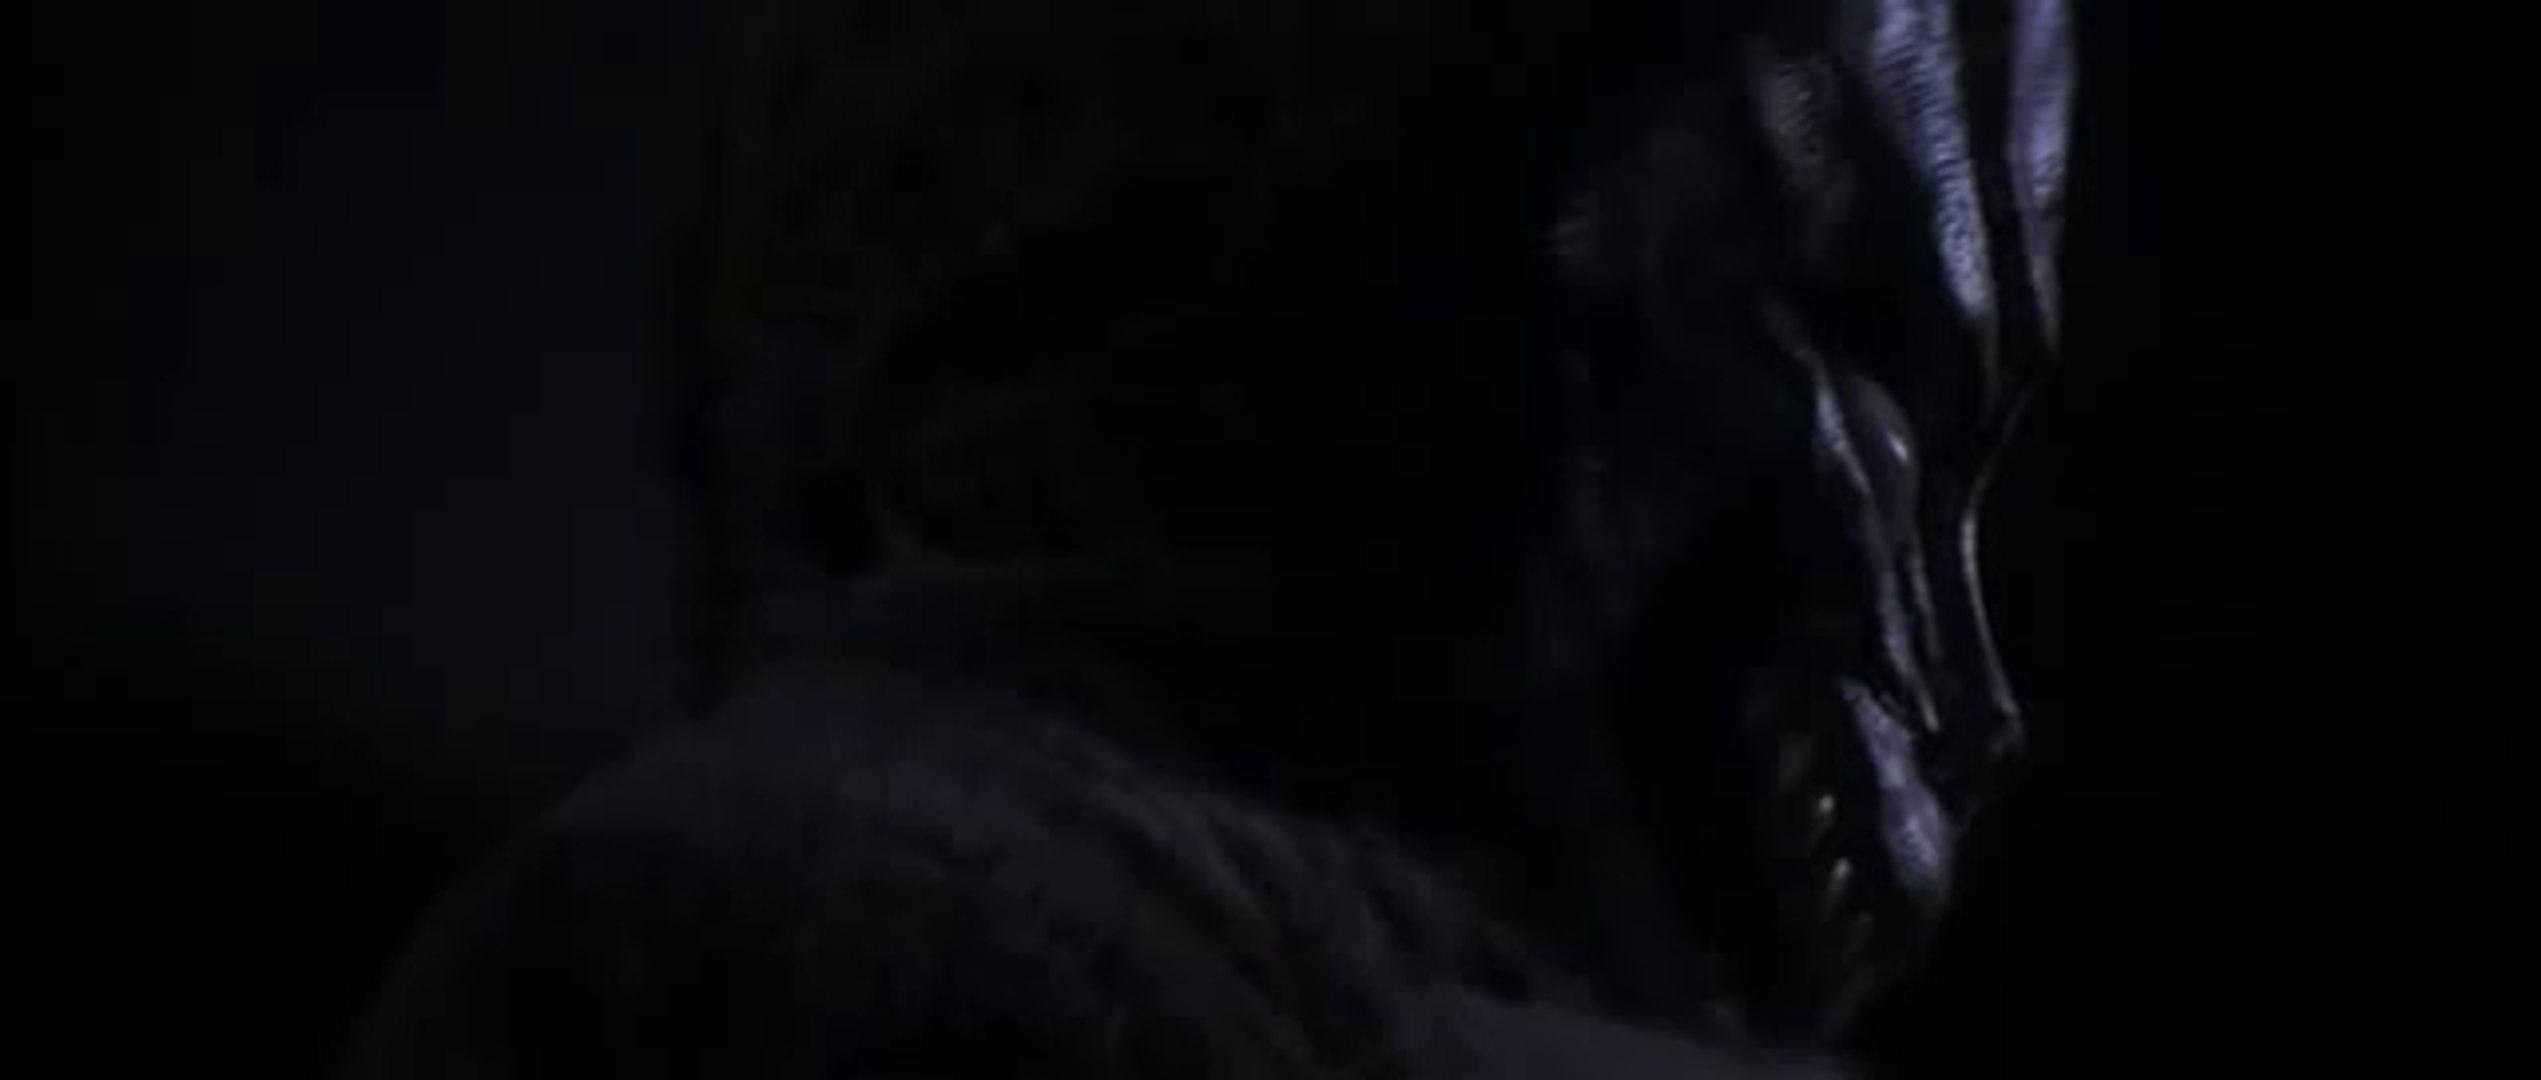 Donnie Darko - Movie Theatre Scene (High Quality)